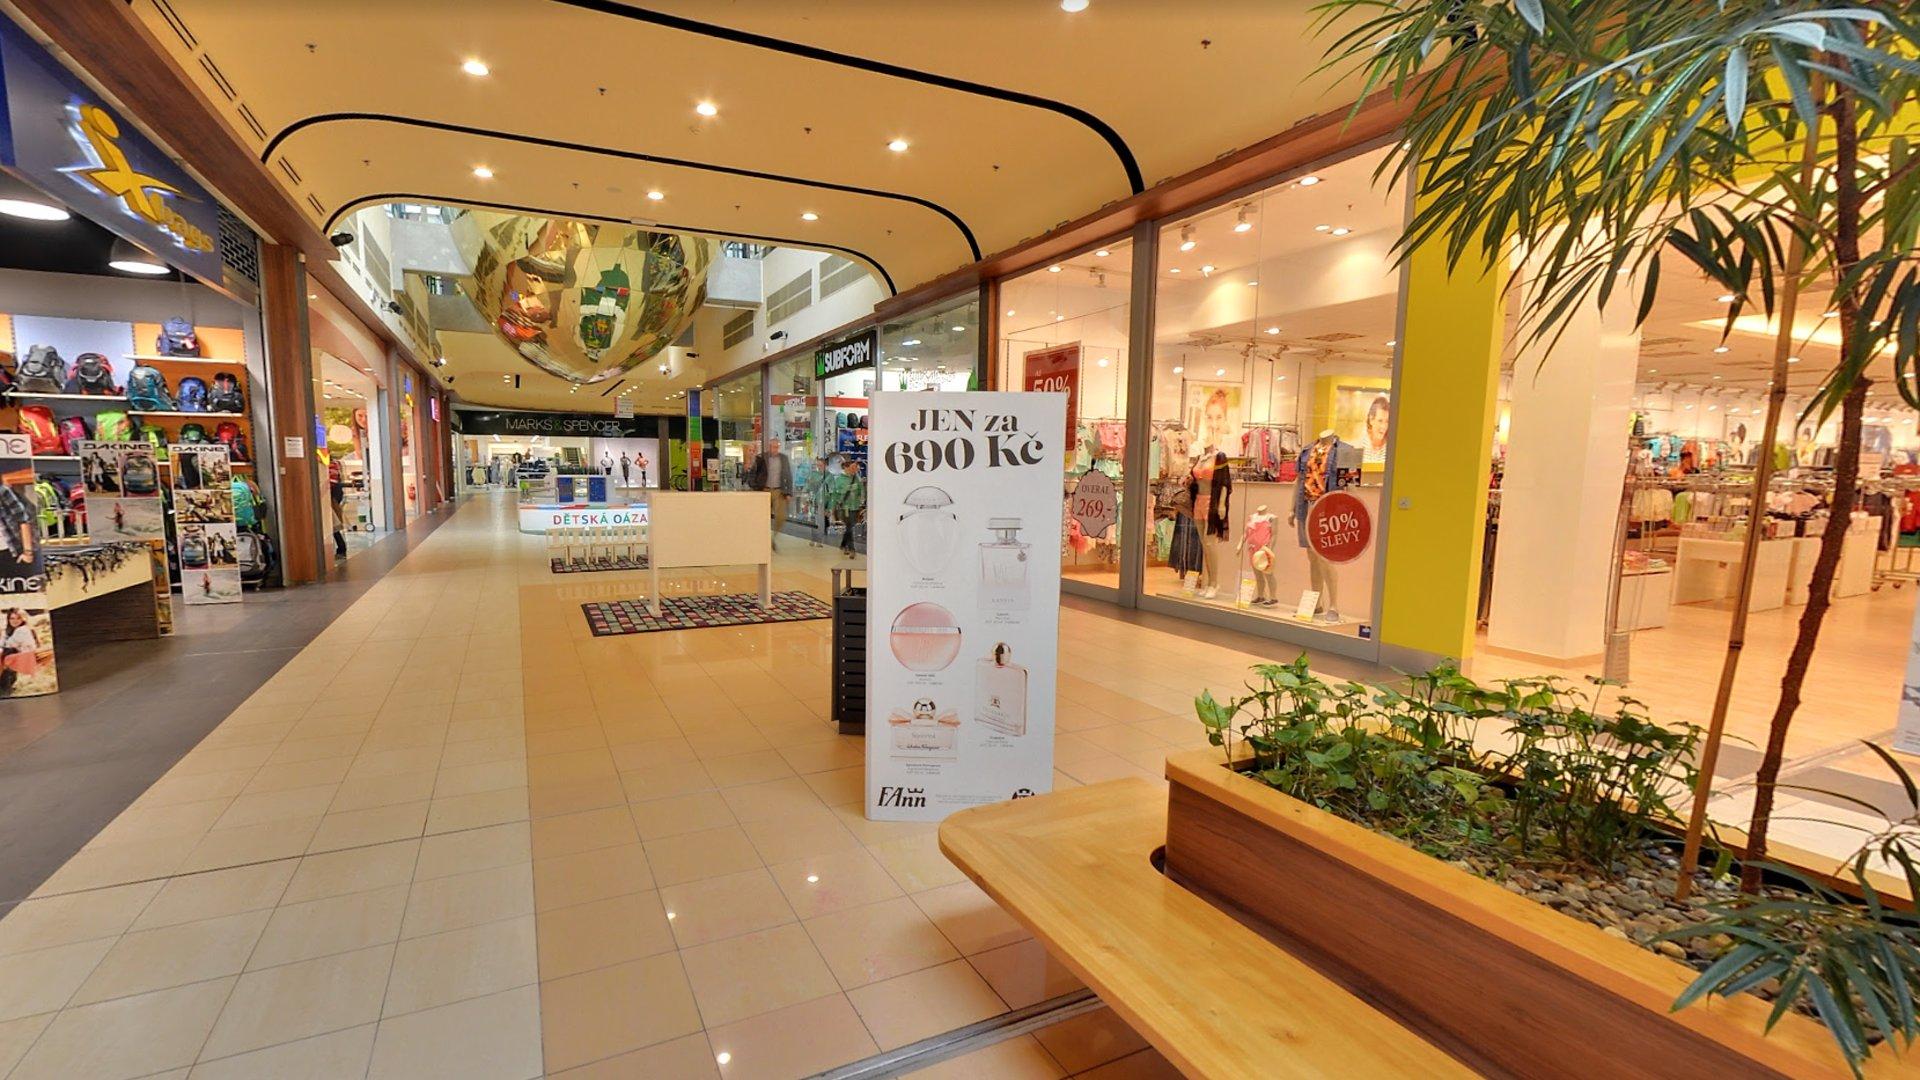 OC Nisa Liberec – Kino, obchody, Albert, moje tipy